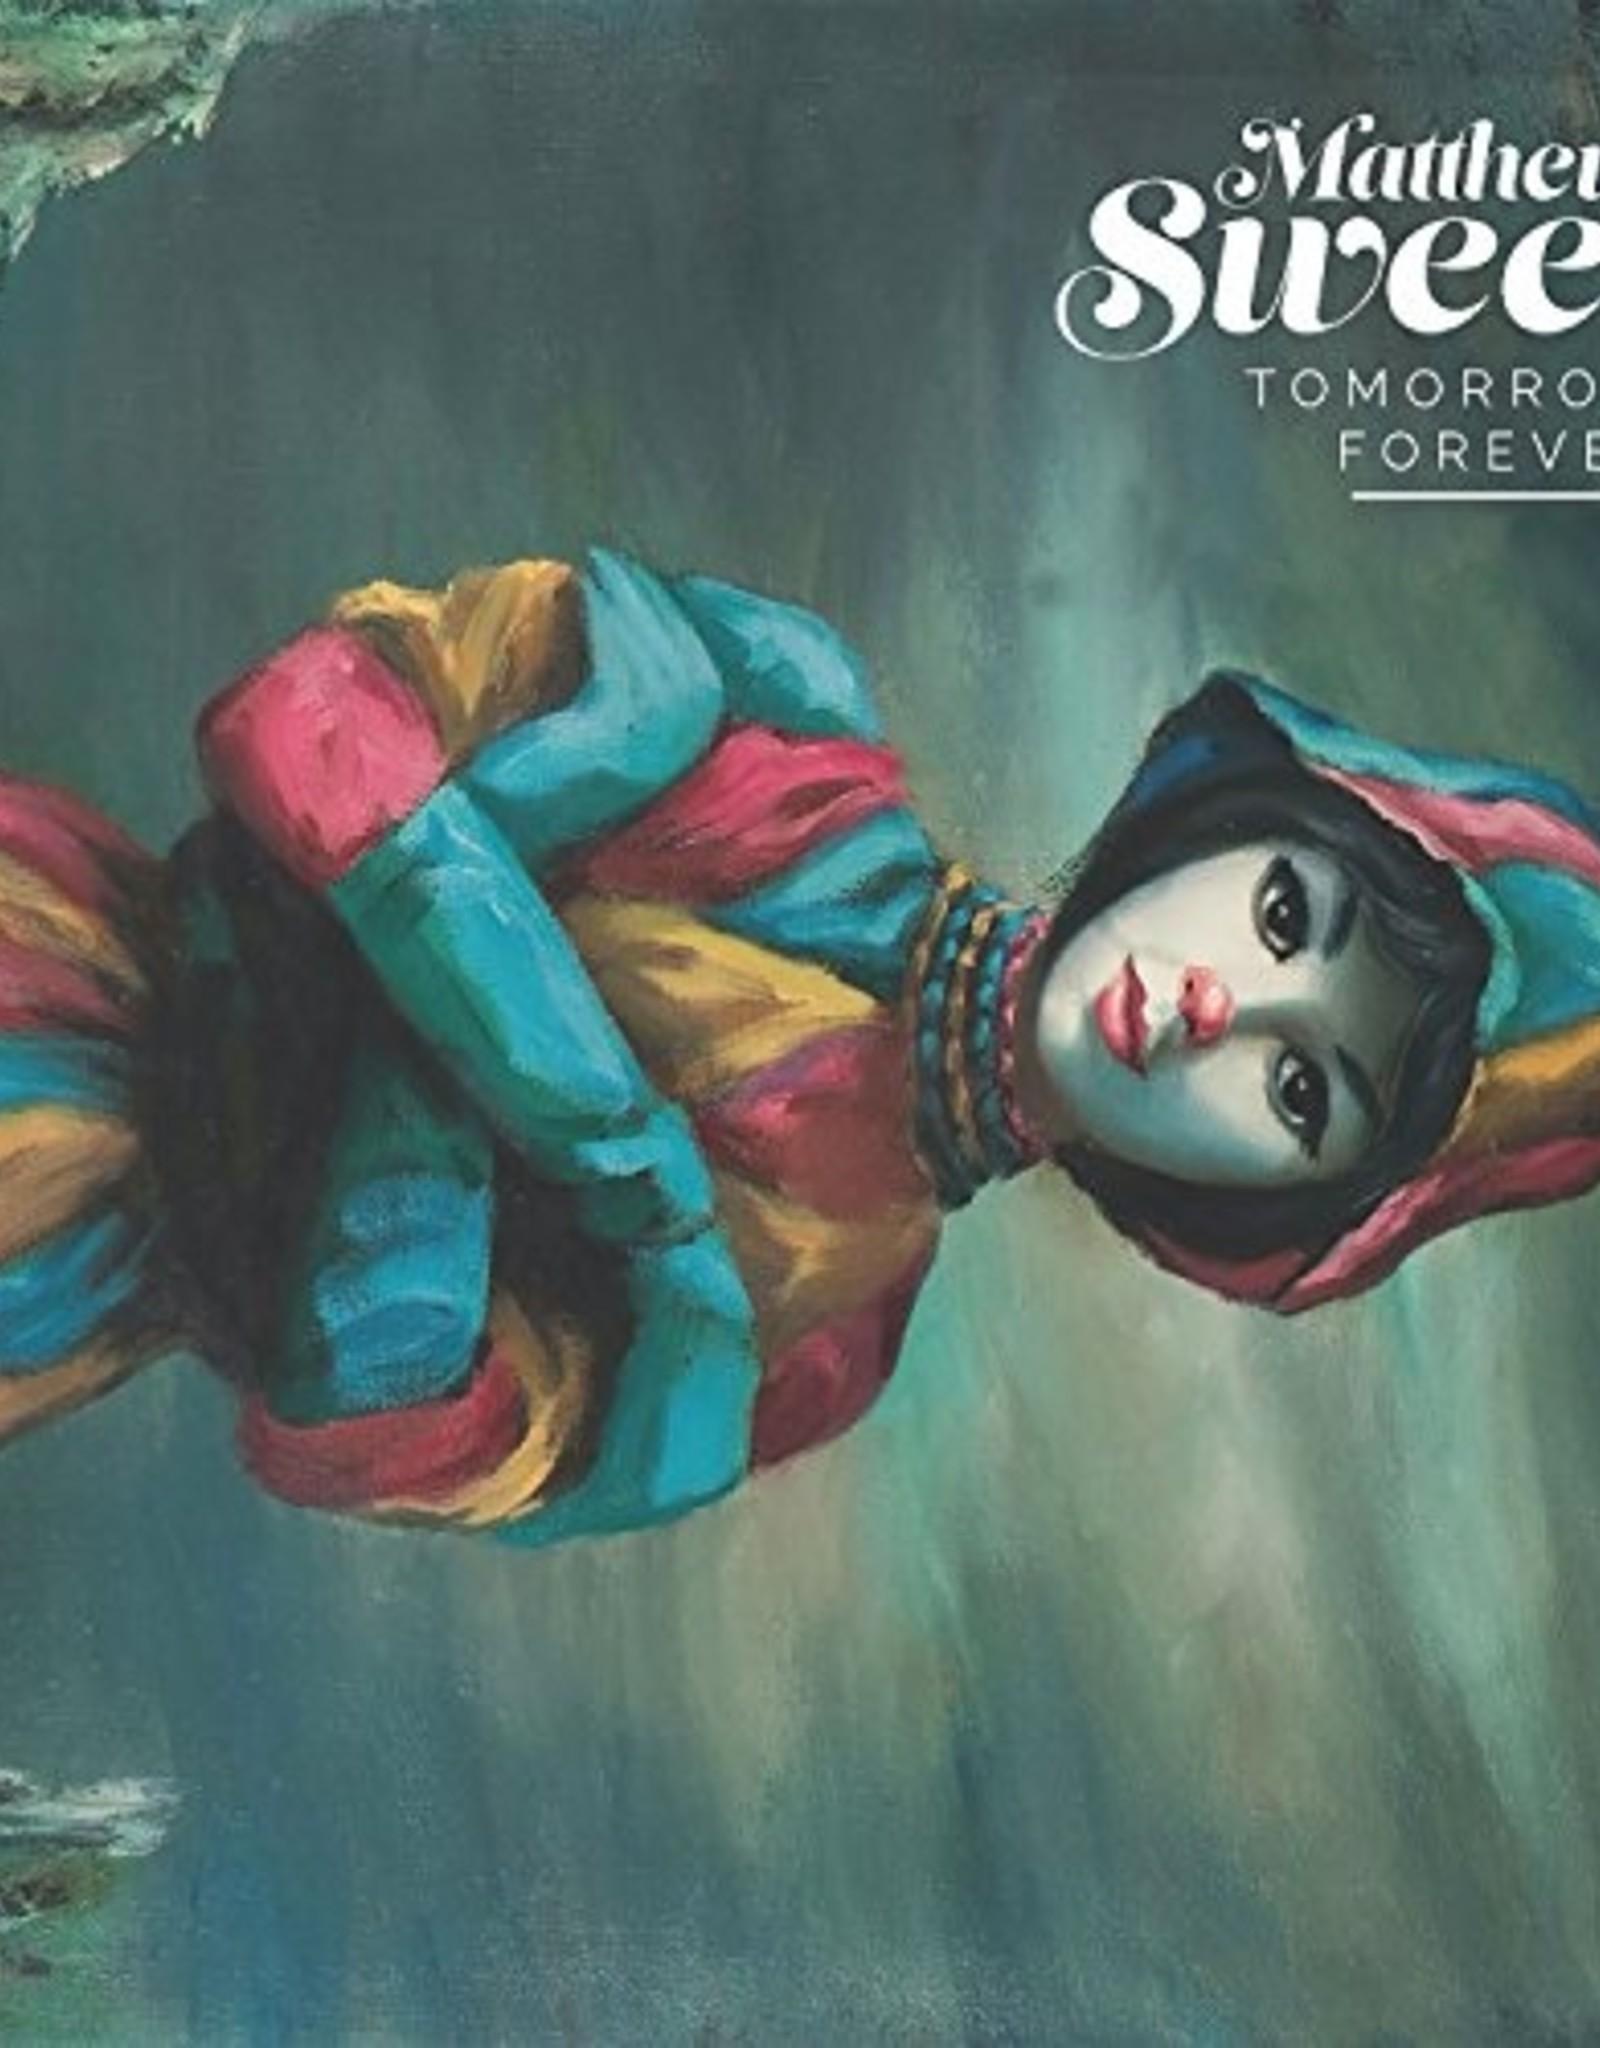 Matthew Sweet - Tomorrow Forever